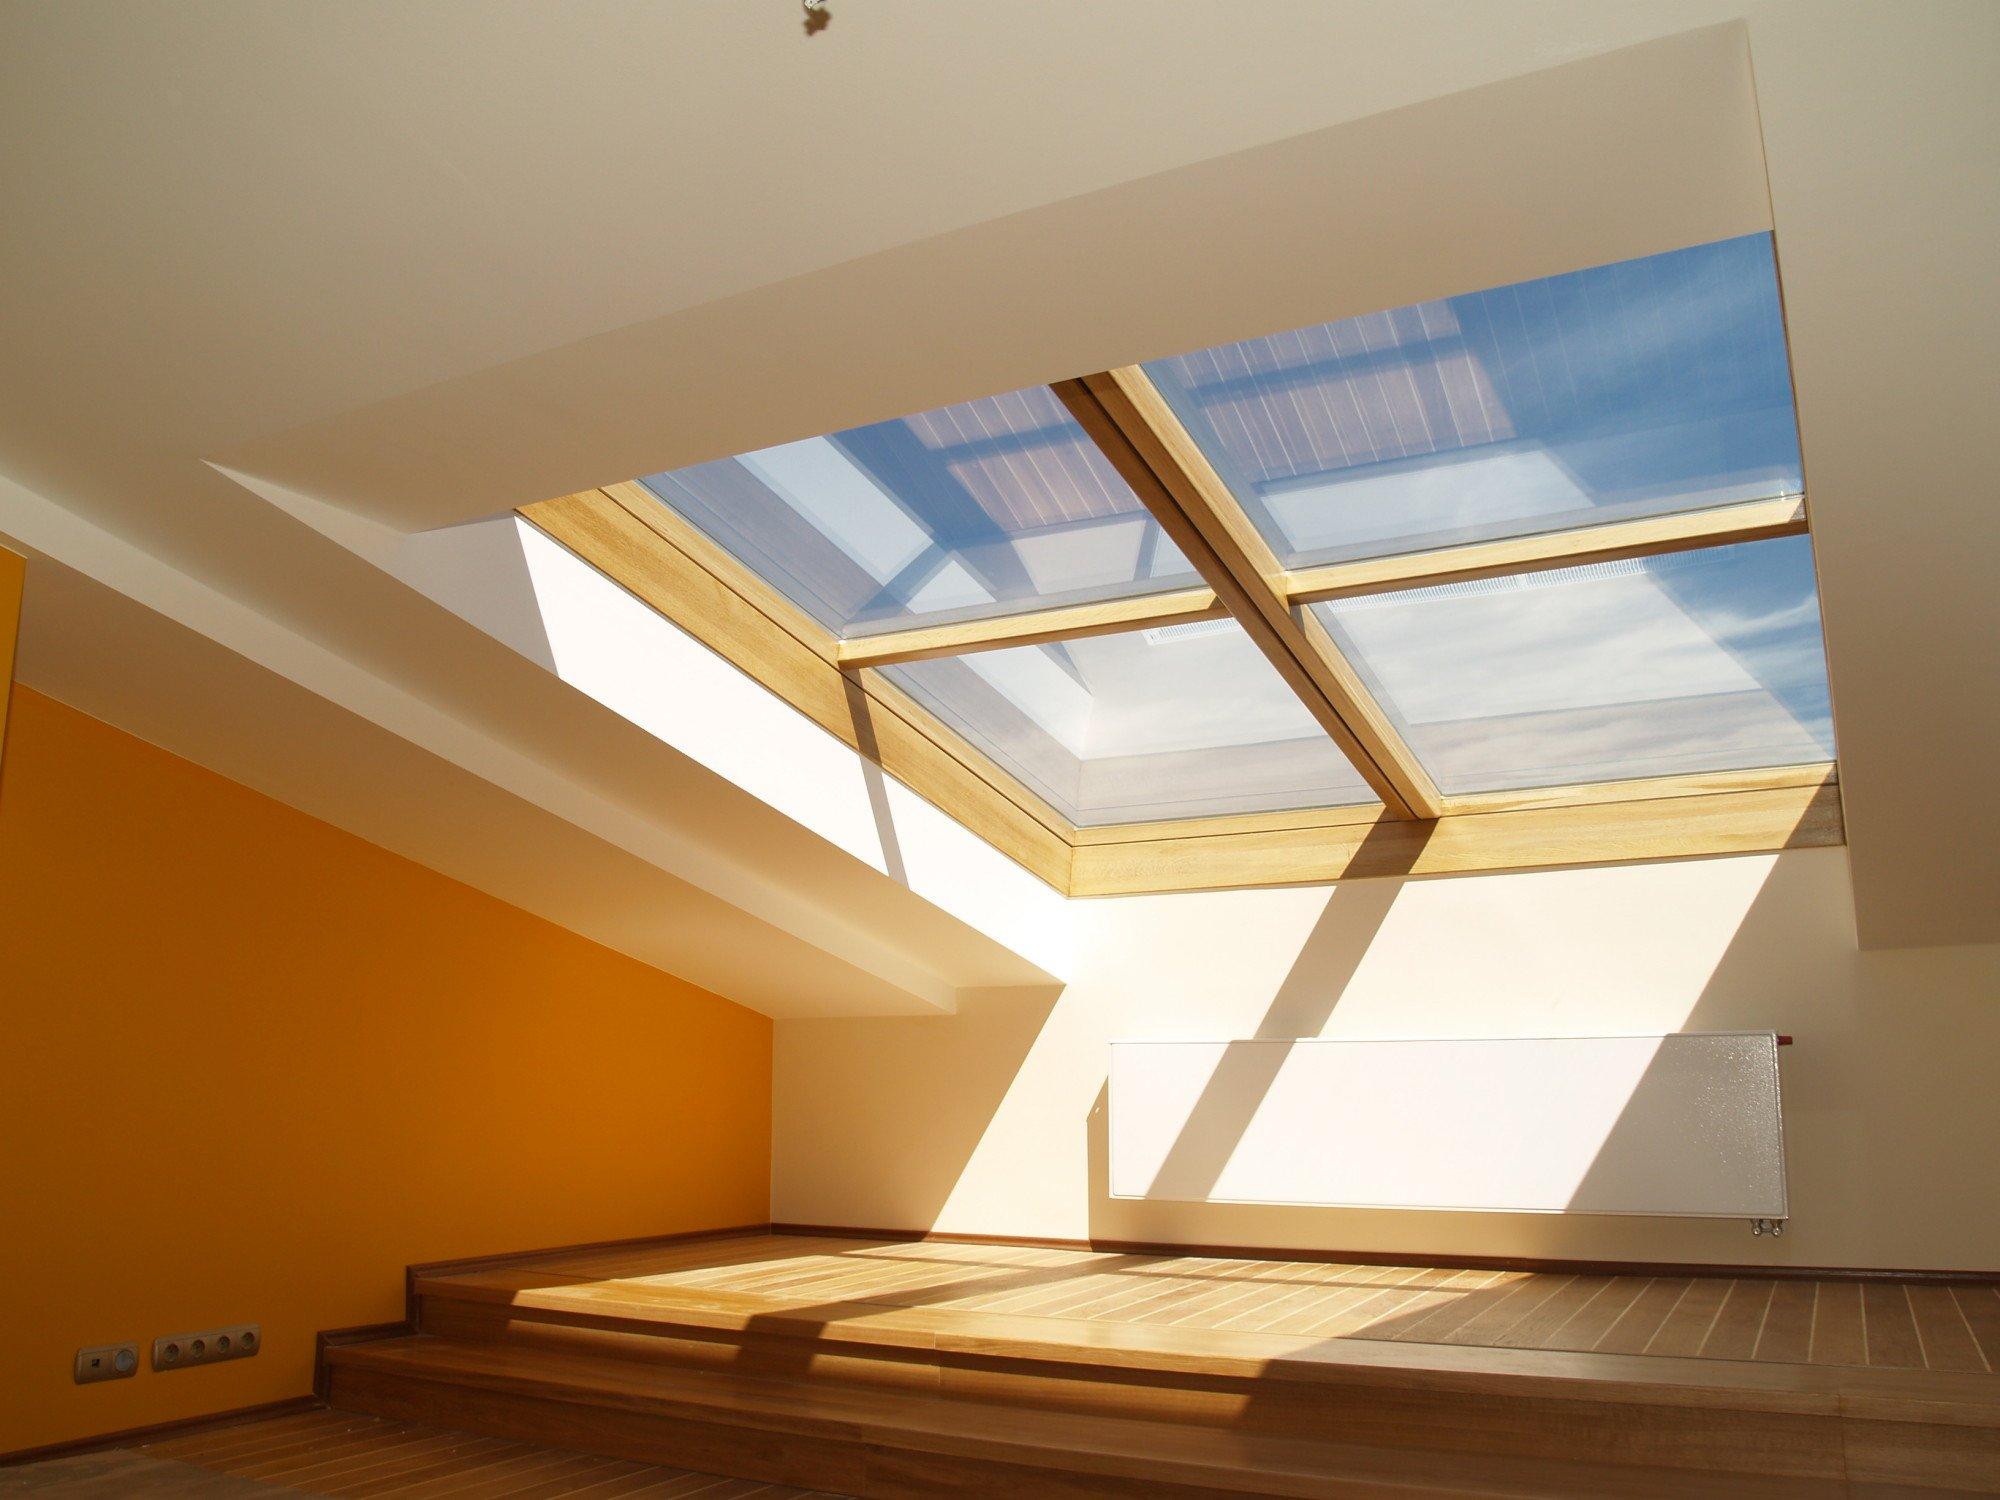 gro formatiger dachziegel in merlotrot geneigtes dach. Black Bedroom Furniture Sets. Home Design Ideas